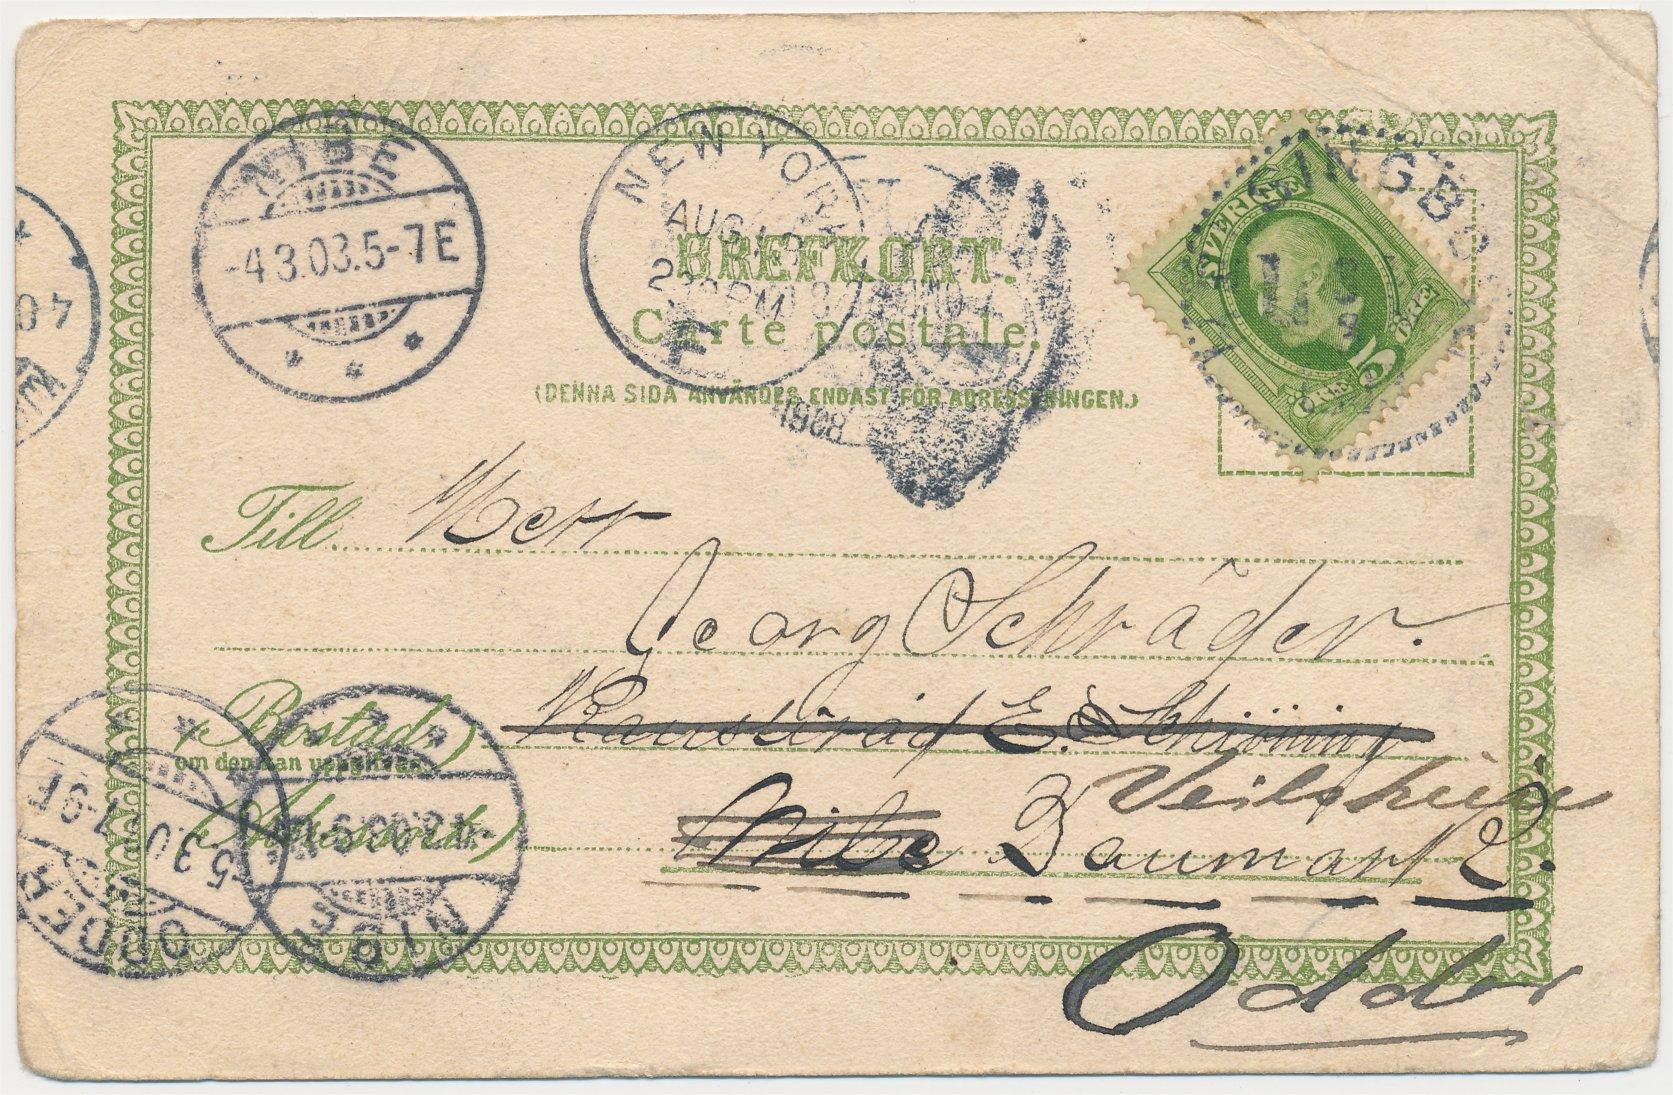 5brevkort_helsingborg_3_3_1903